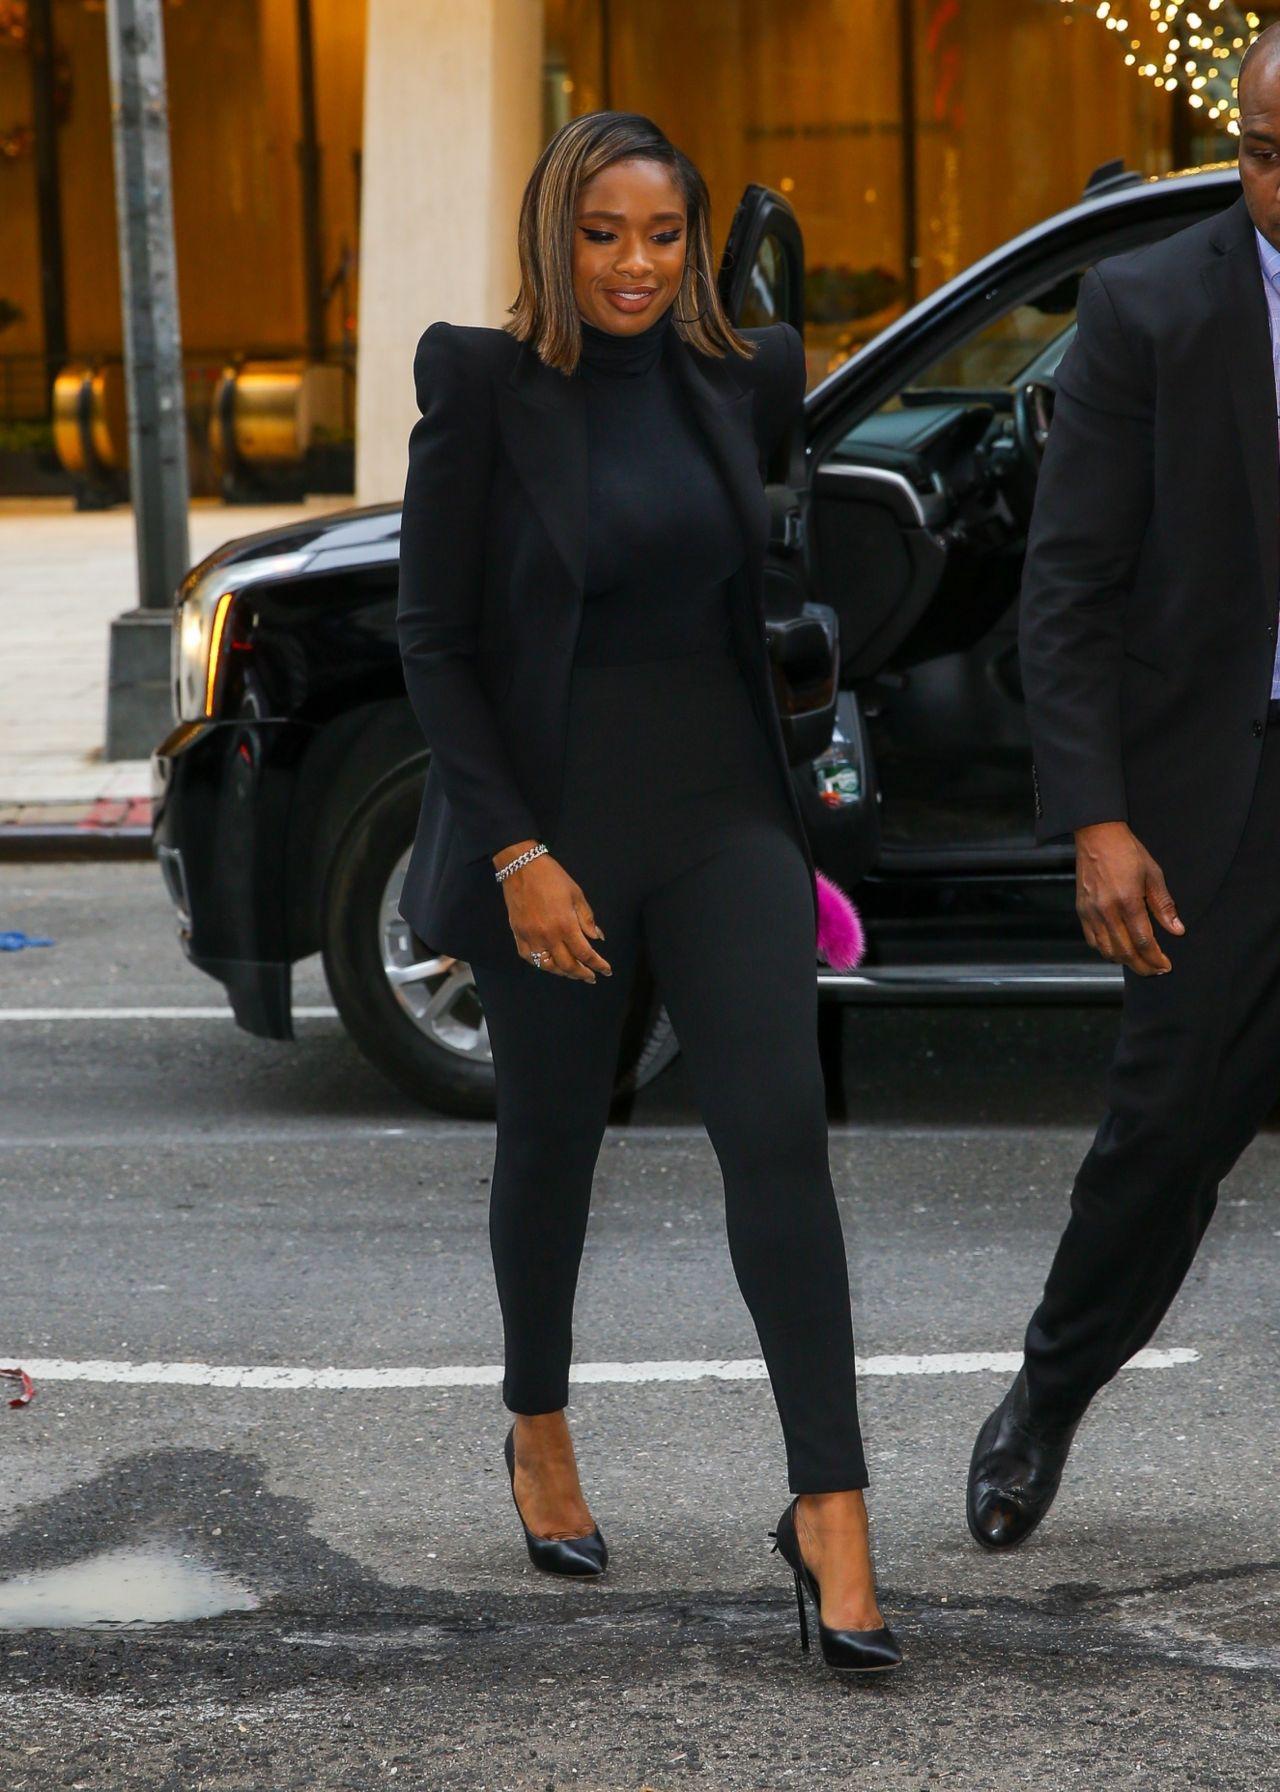 jennifer-hudson-wears-all-black-promoting-cats-in-new-york